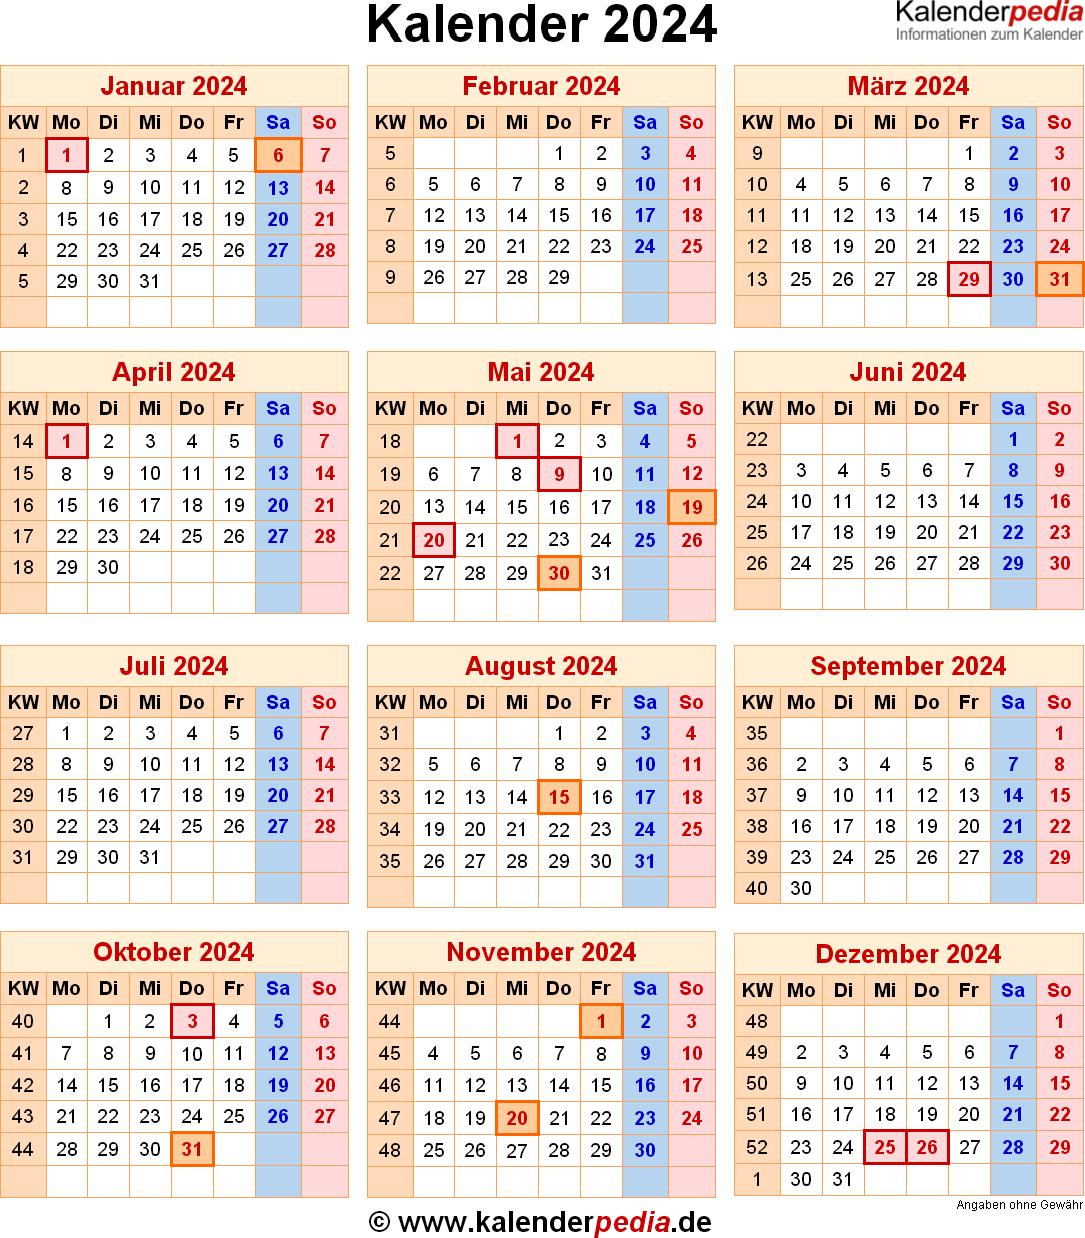 Kalender 2024